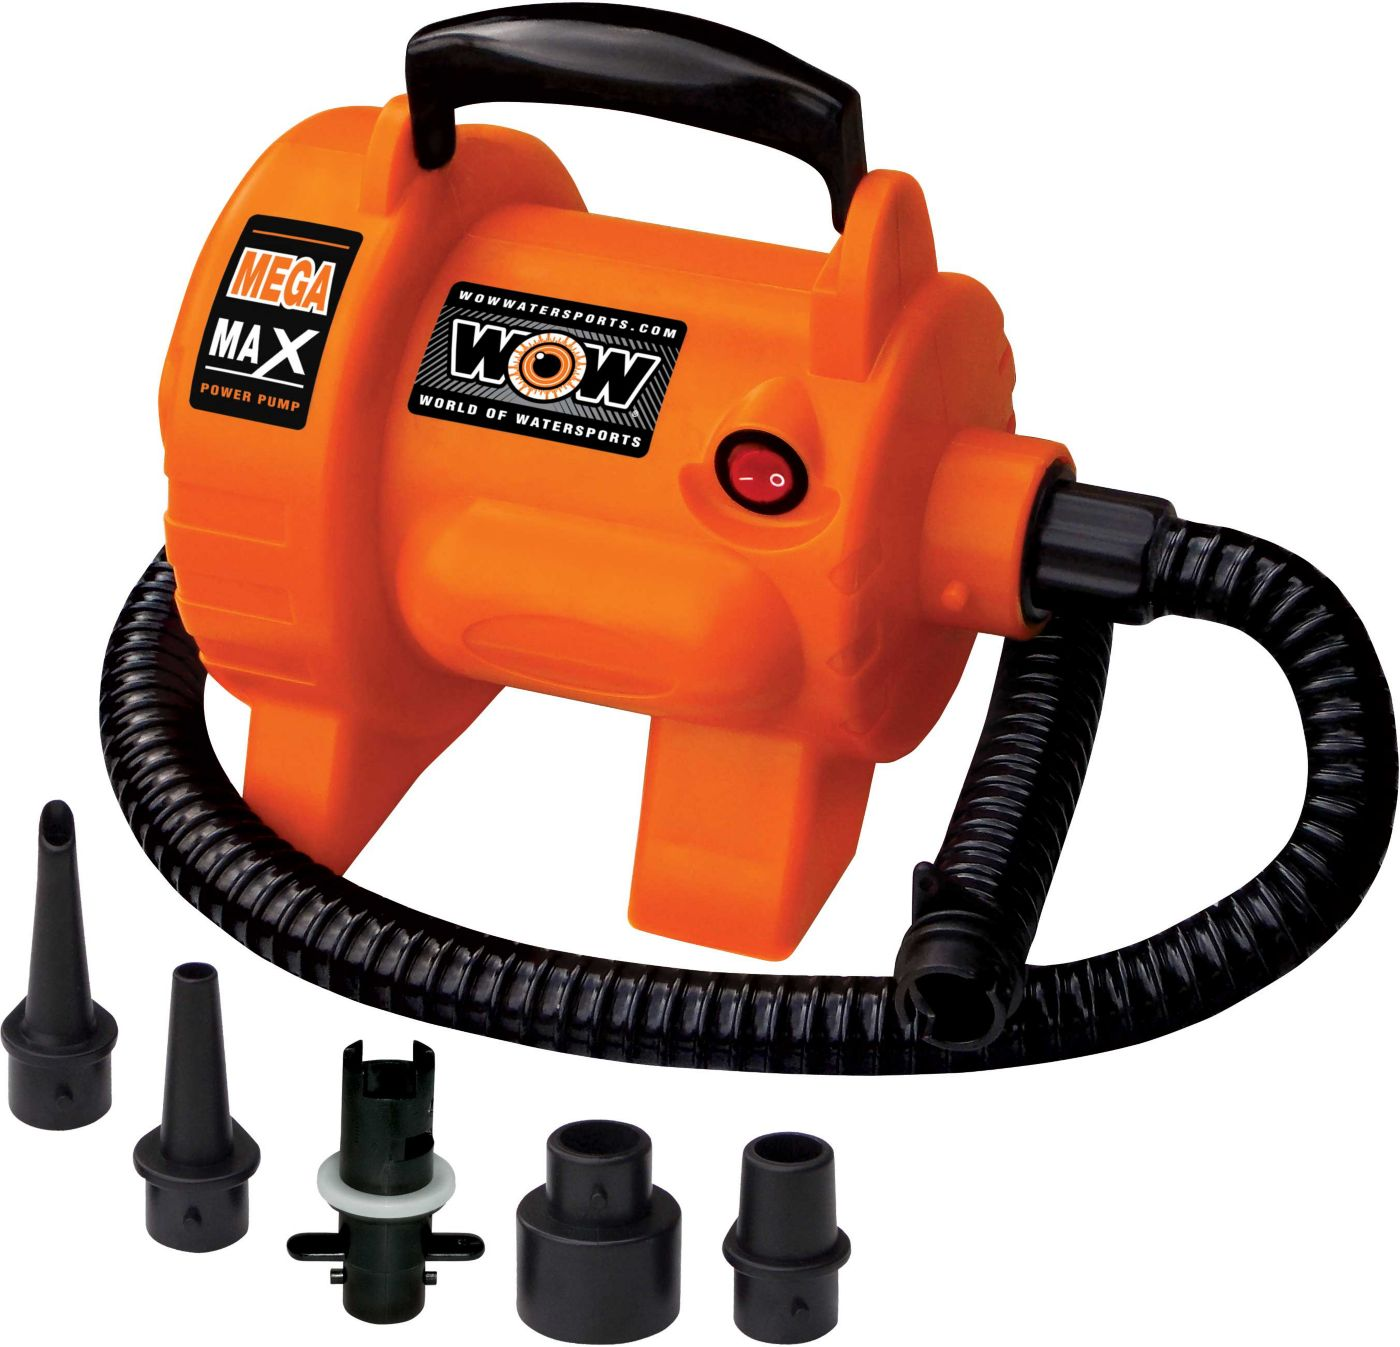 WOW Water Sports Mega Max Power Pump